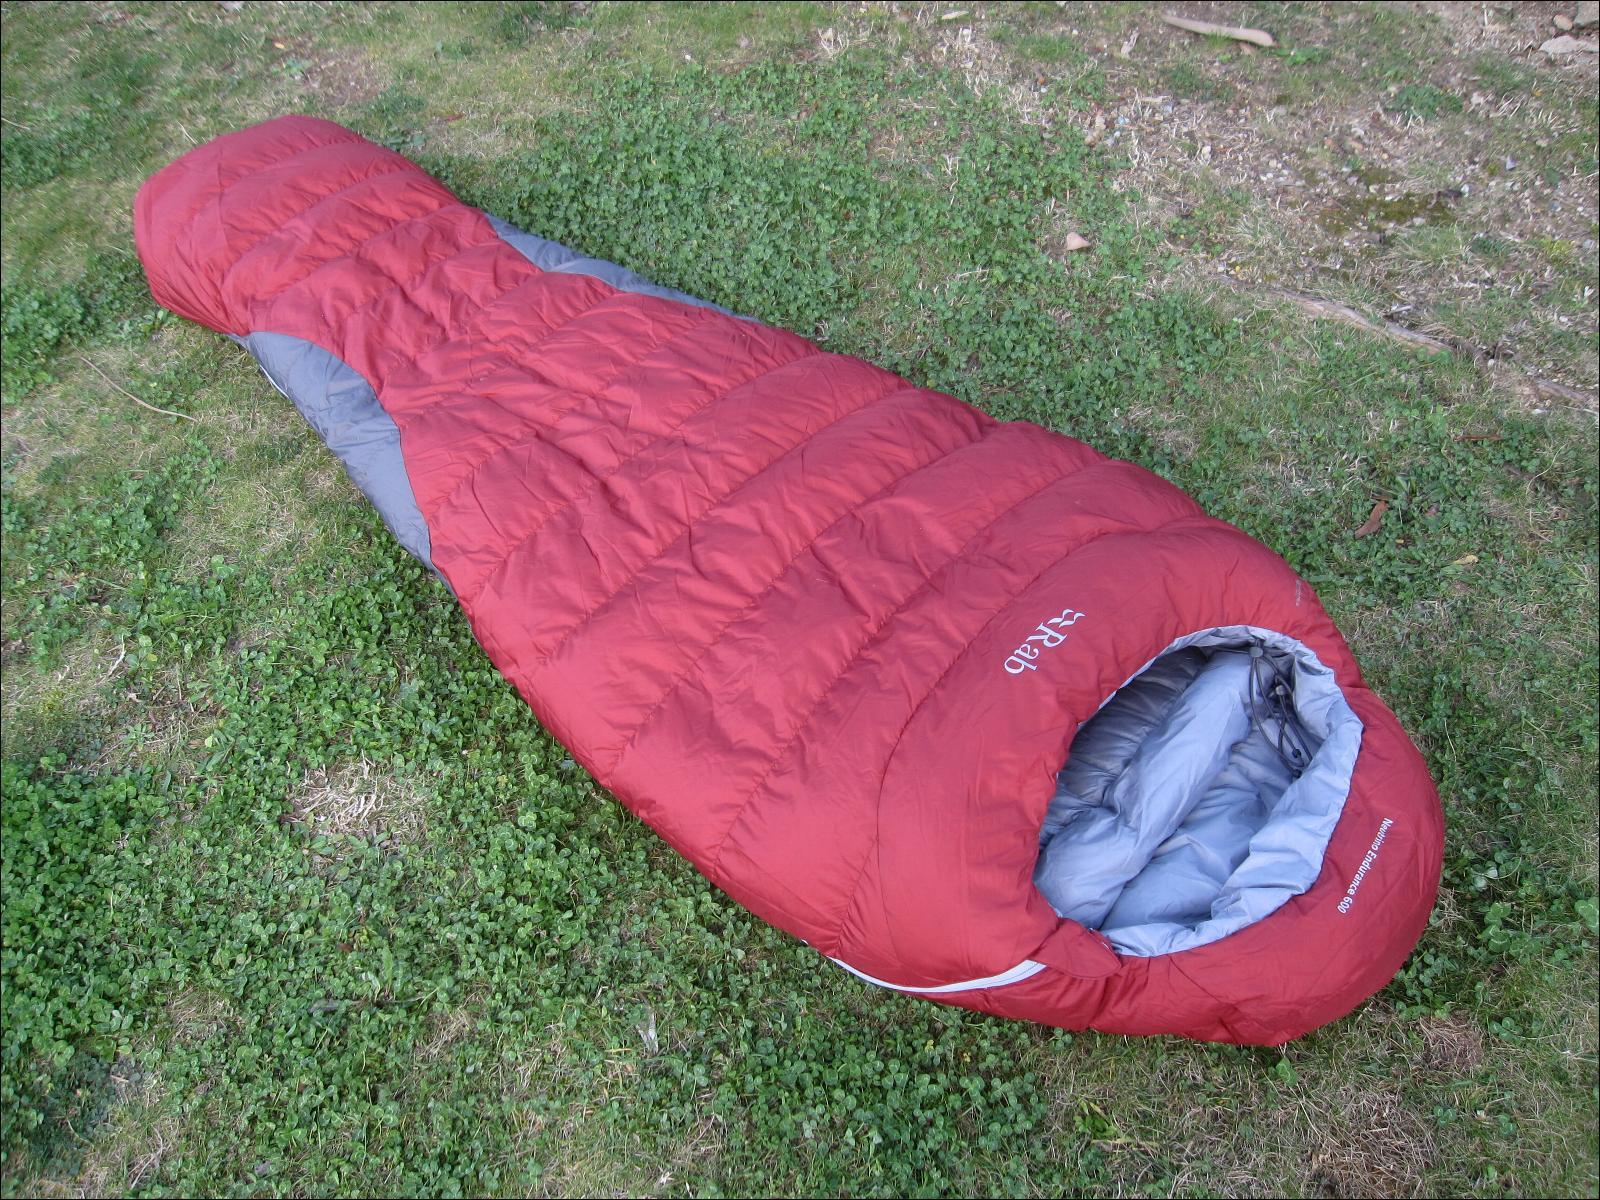 sac de couchage rab